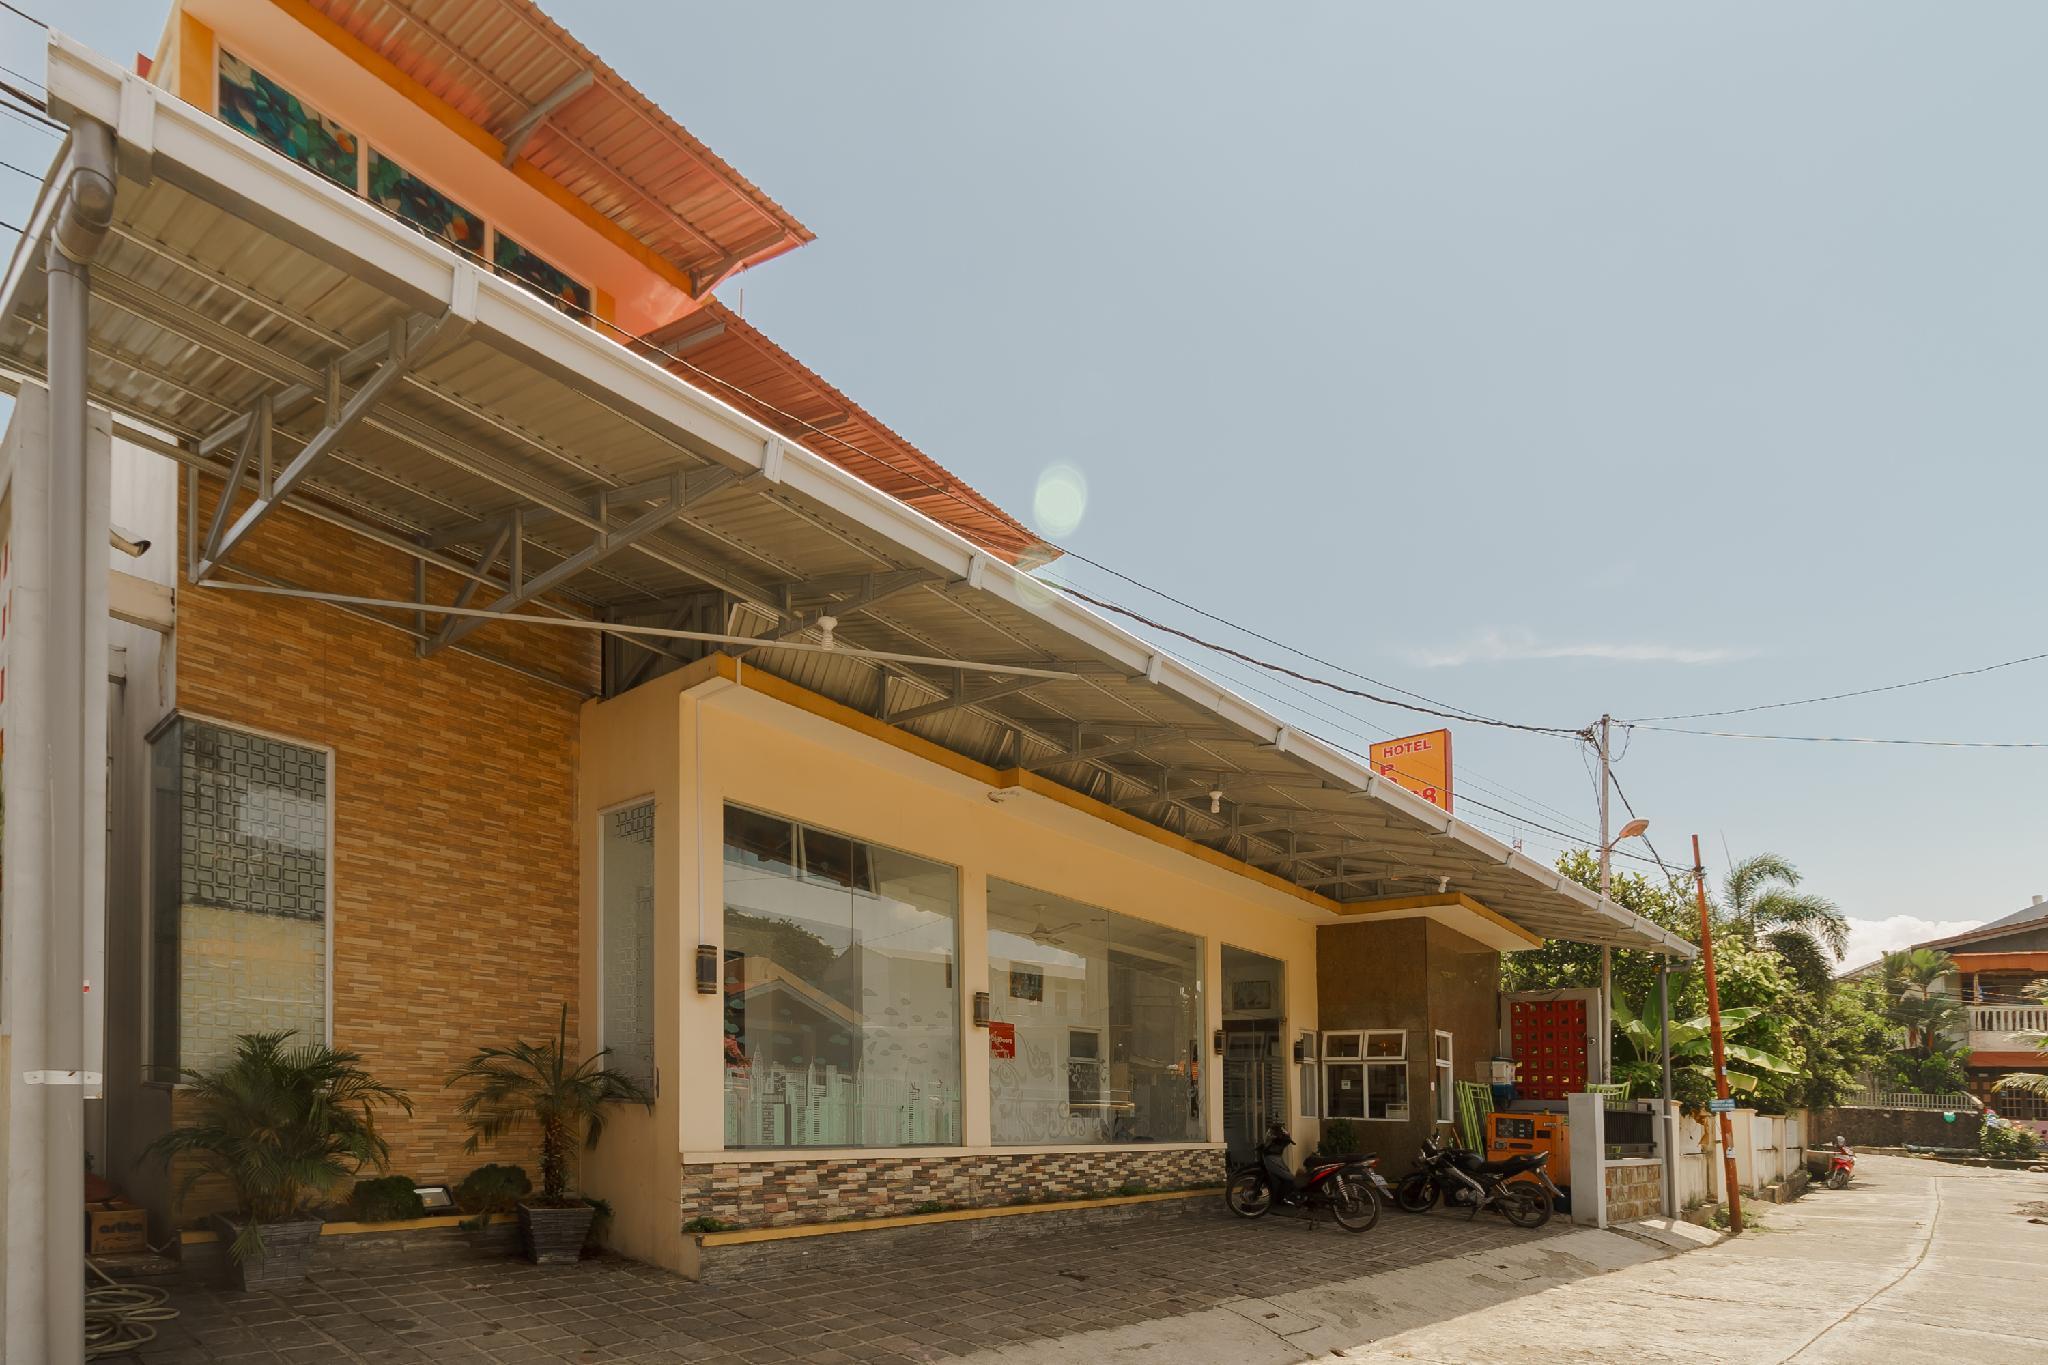 RedDoorz near Jembatan Siti Nurbaya Padang